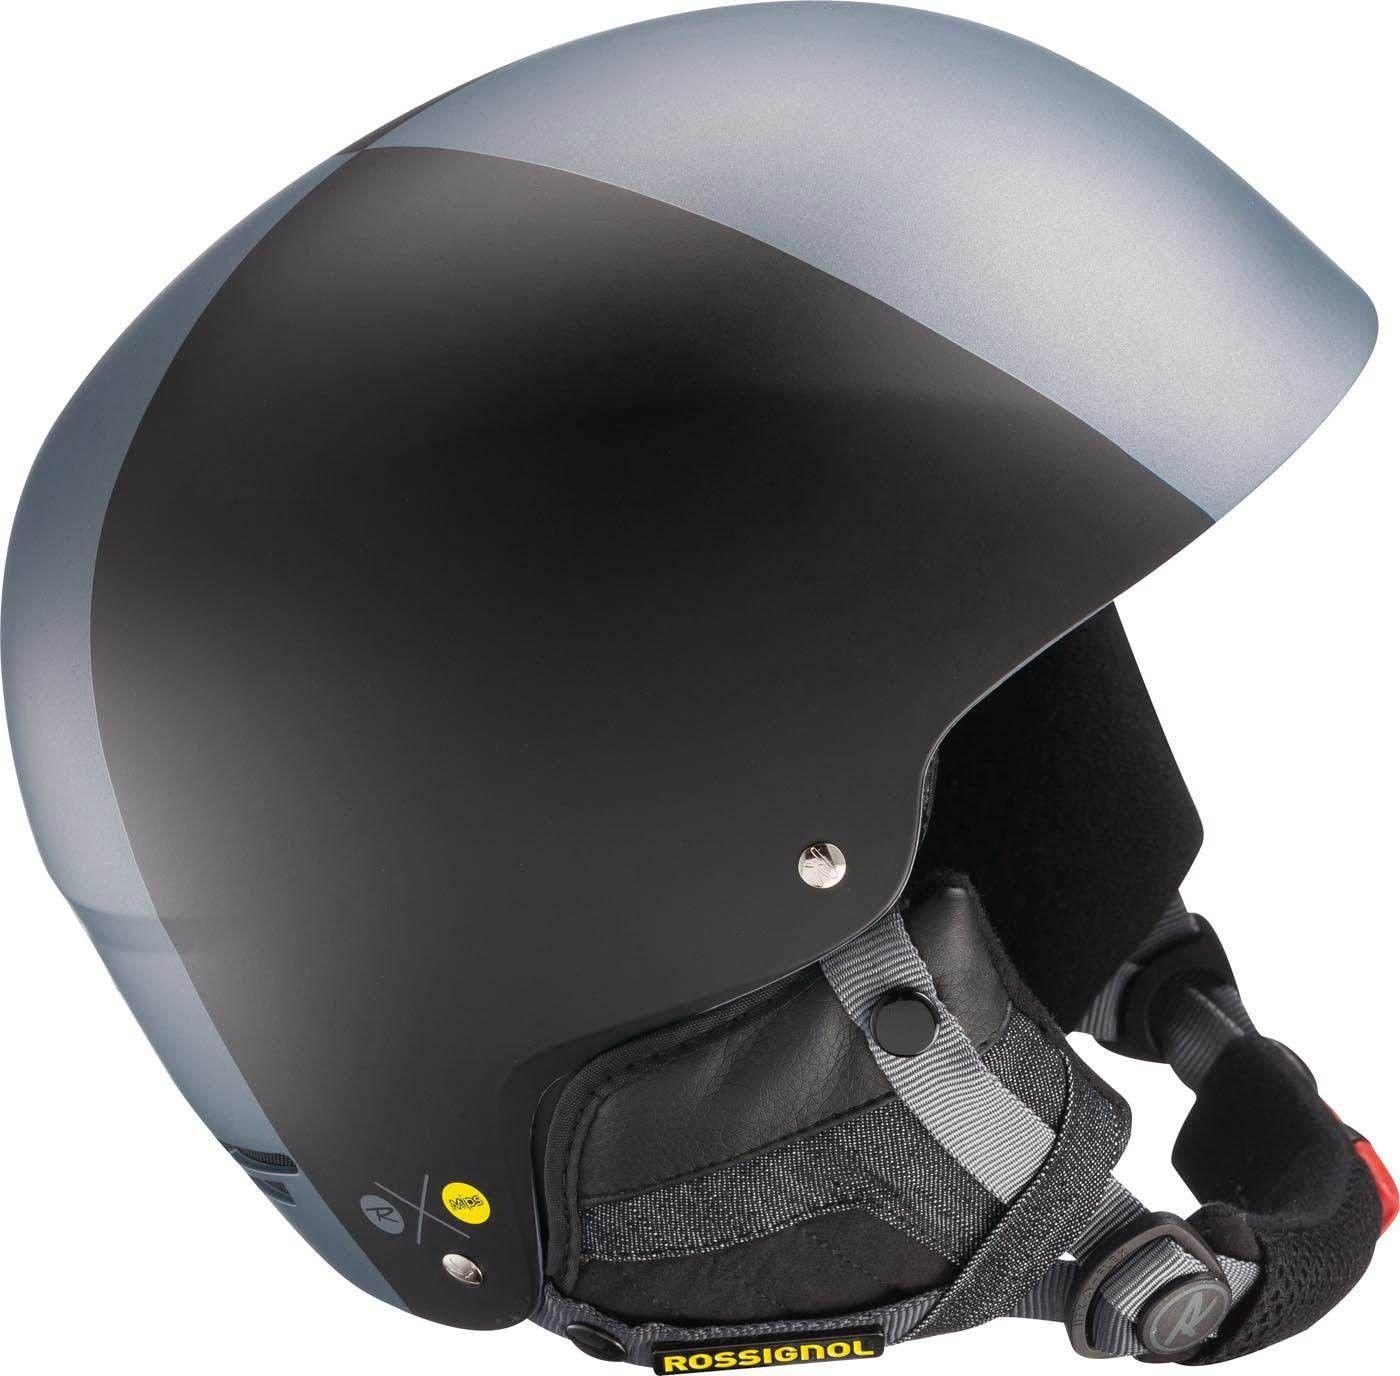 Rossignol Spark Mips | Größe L/XL,M/L |  Ski- & Snowboardhelm